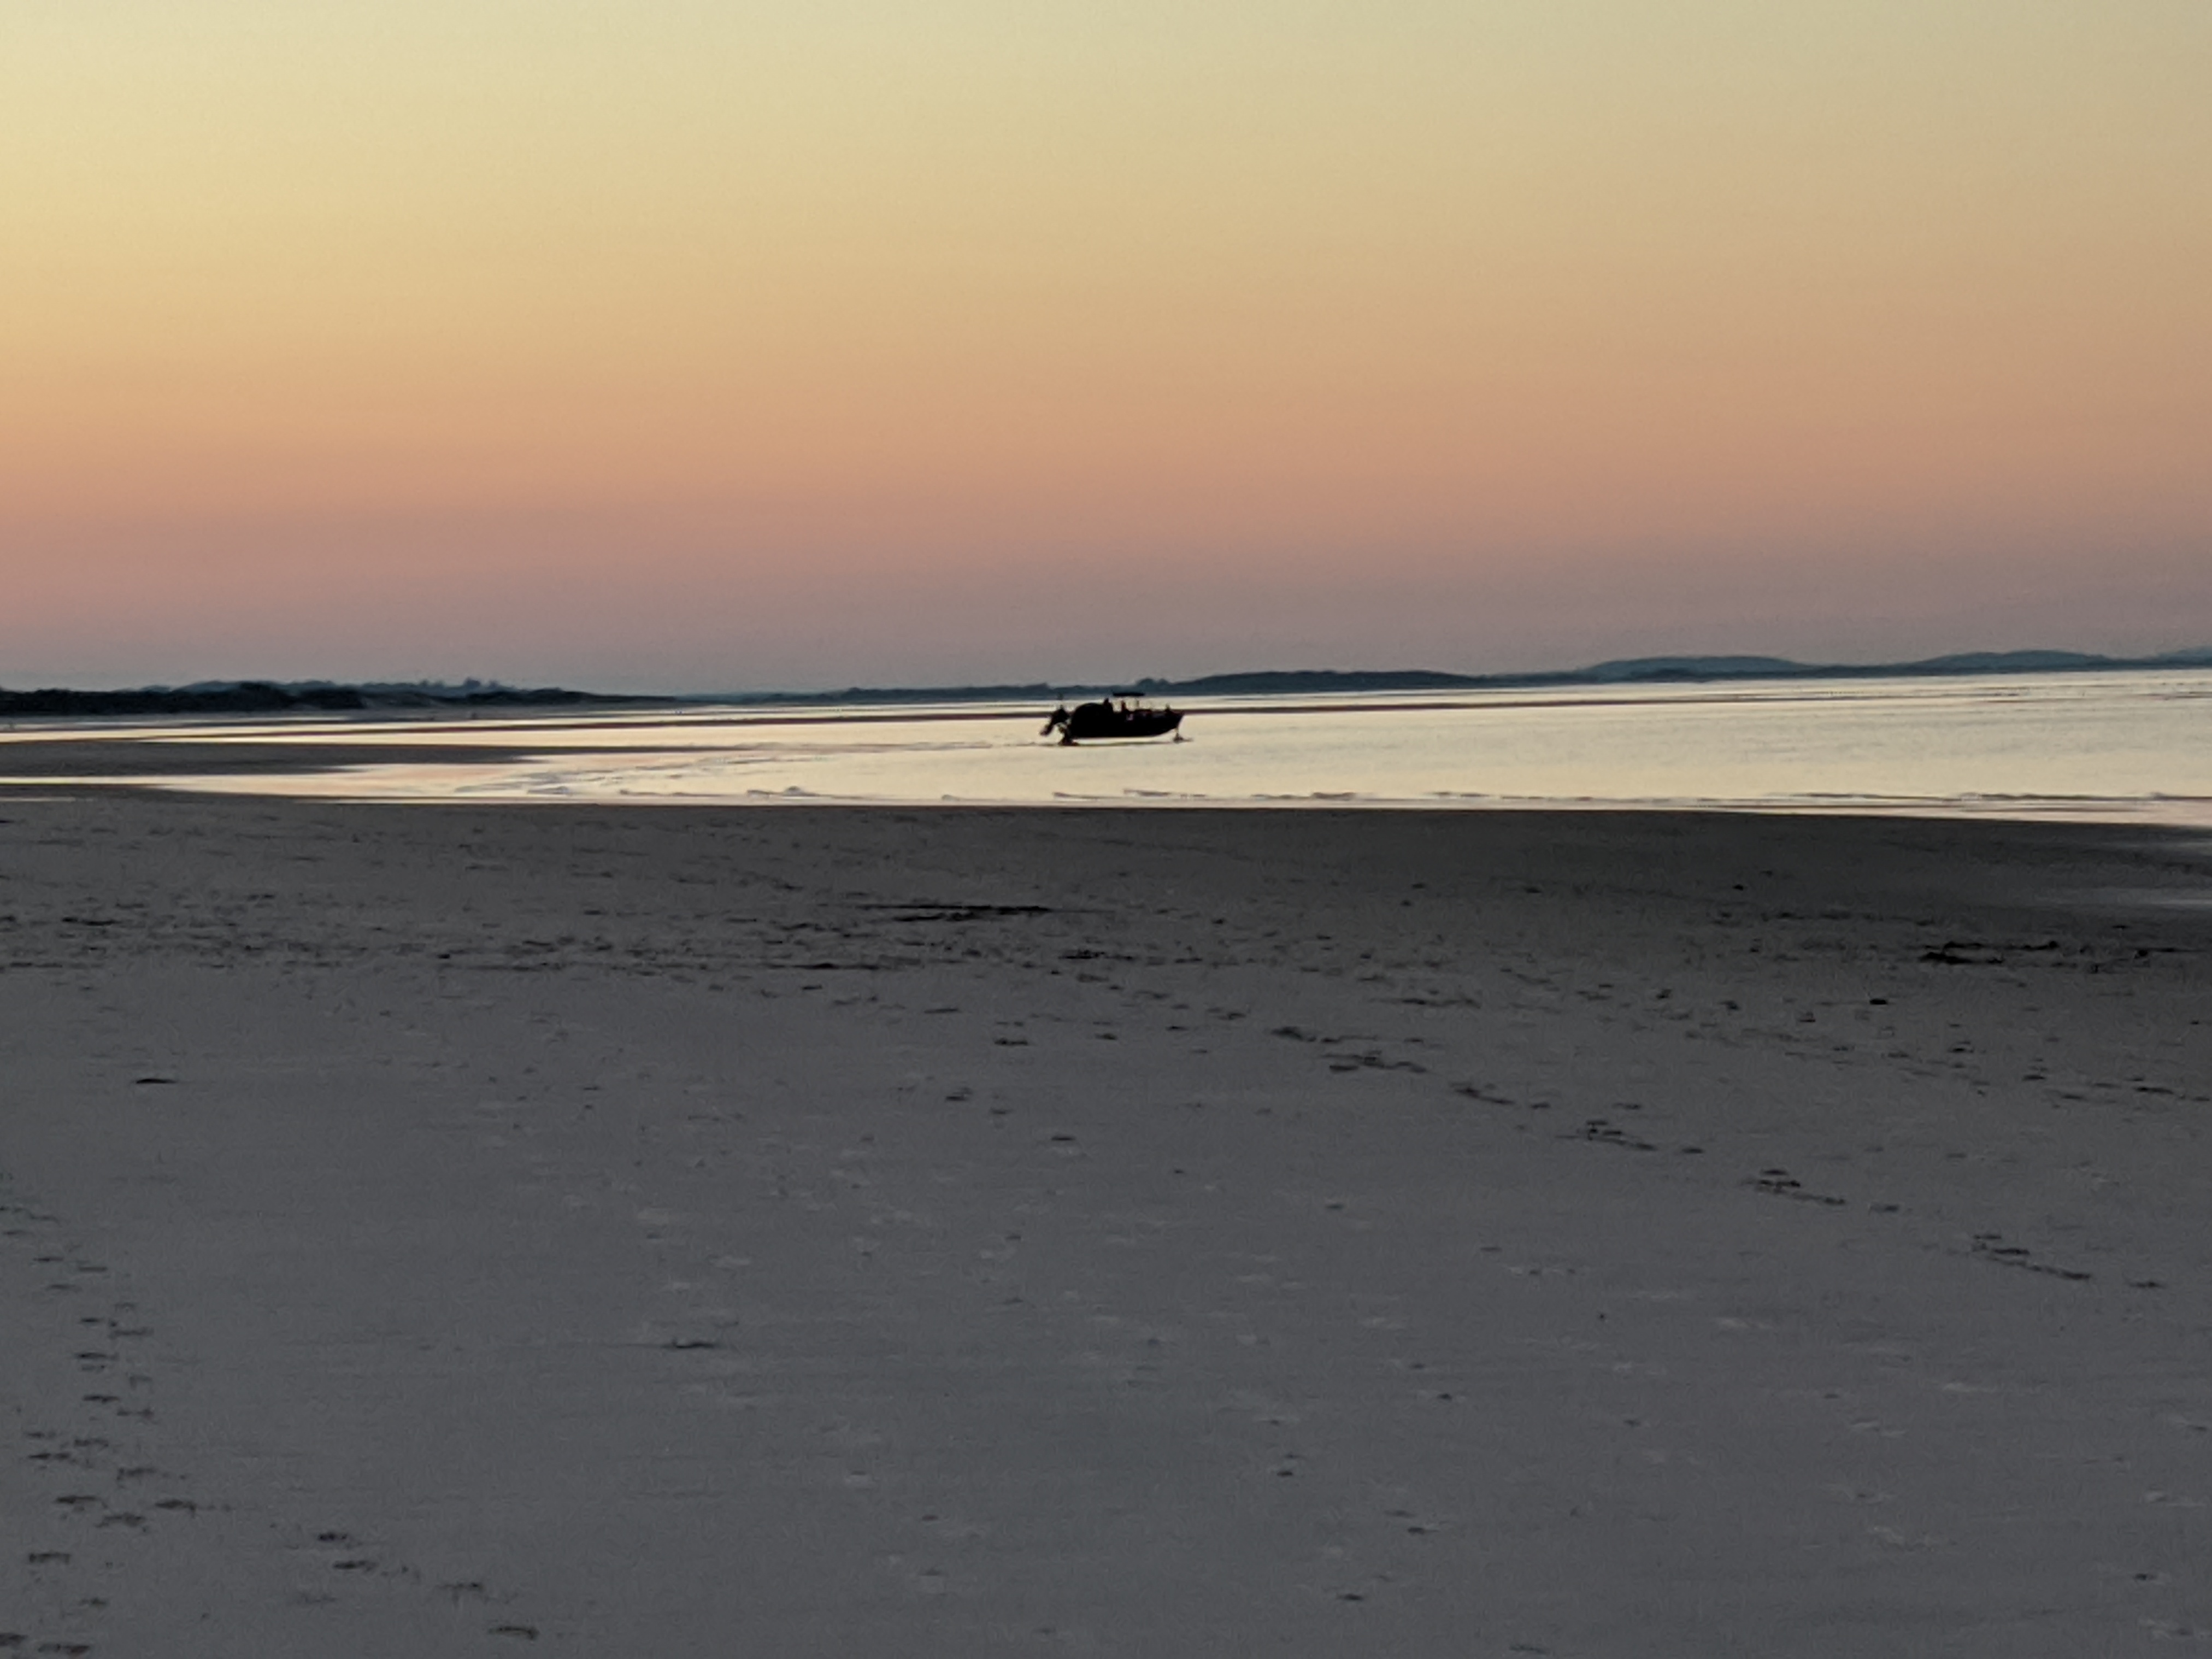 Amphibious Motor Boat tow acrosss low tide beach_20200724_Gloucester Mass ©c ryan (2)